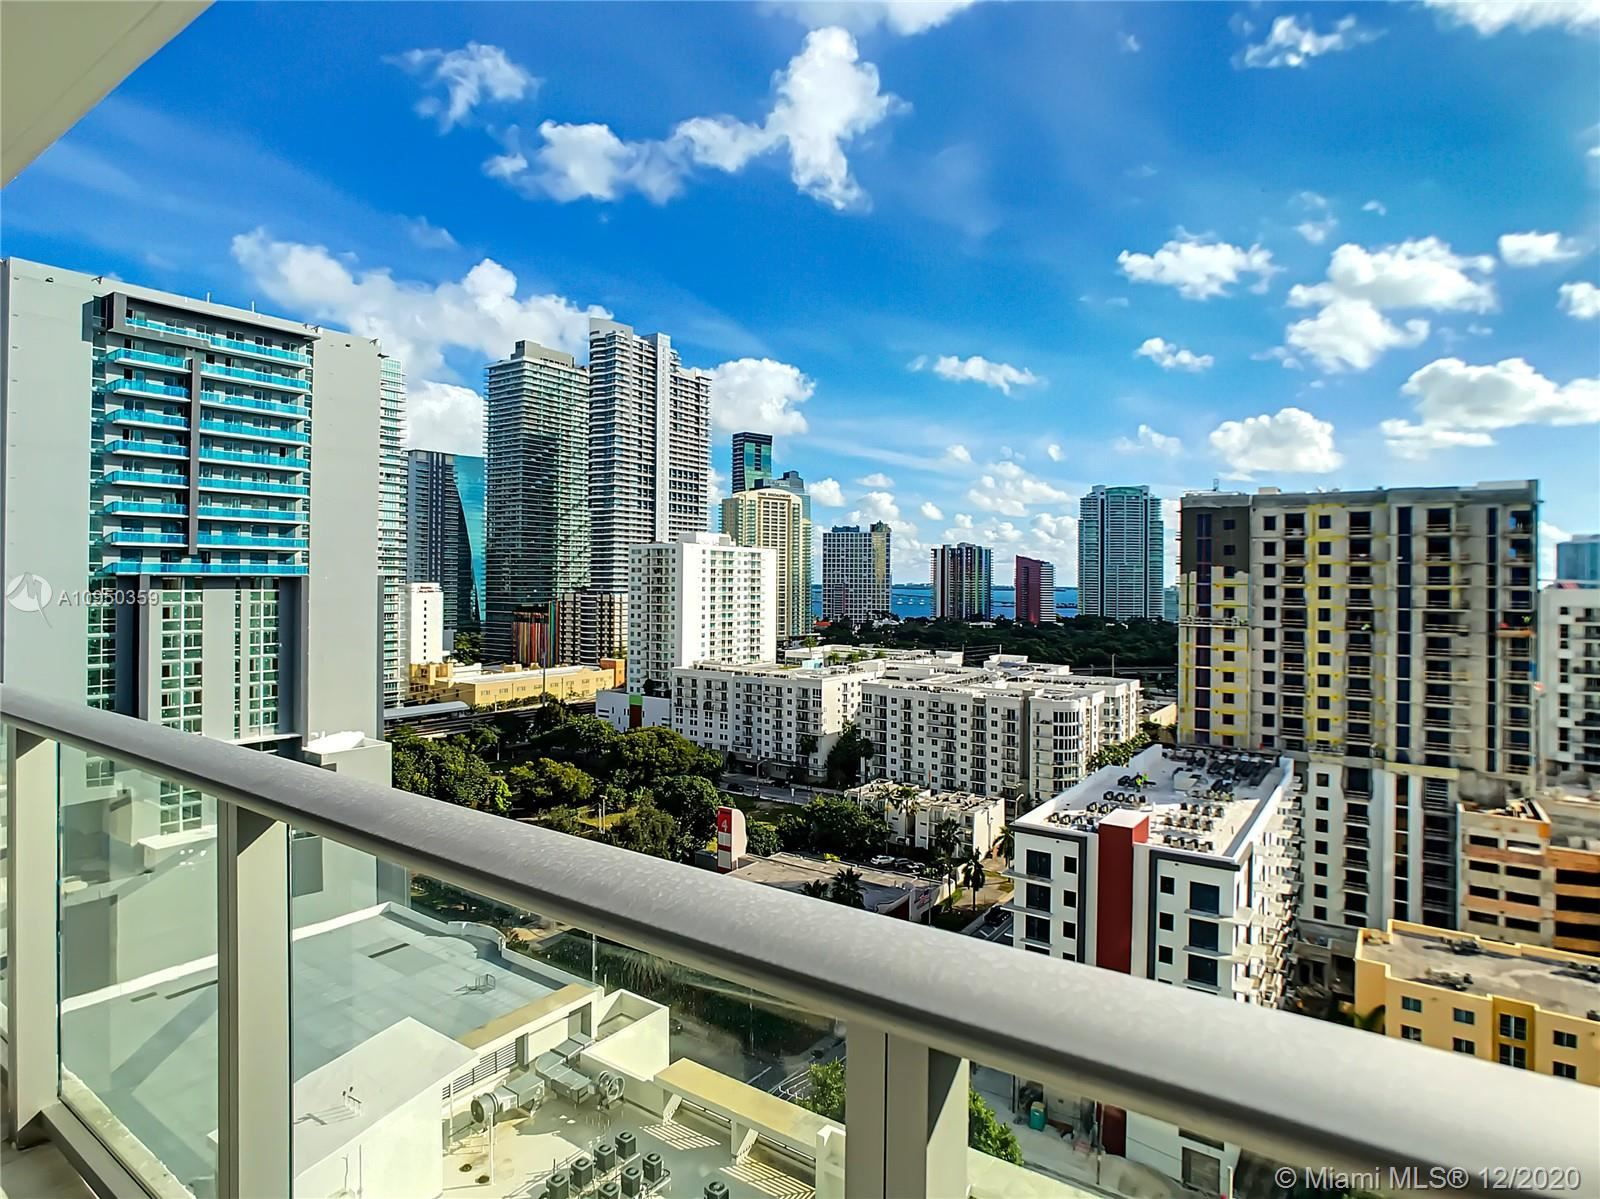 1010 SW 2nd Ave #1701, Miami, FL 33130 - #: A10950359